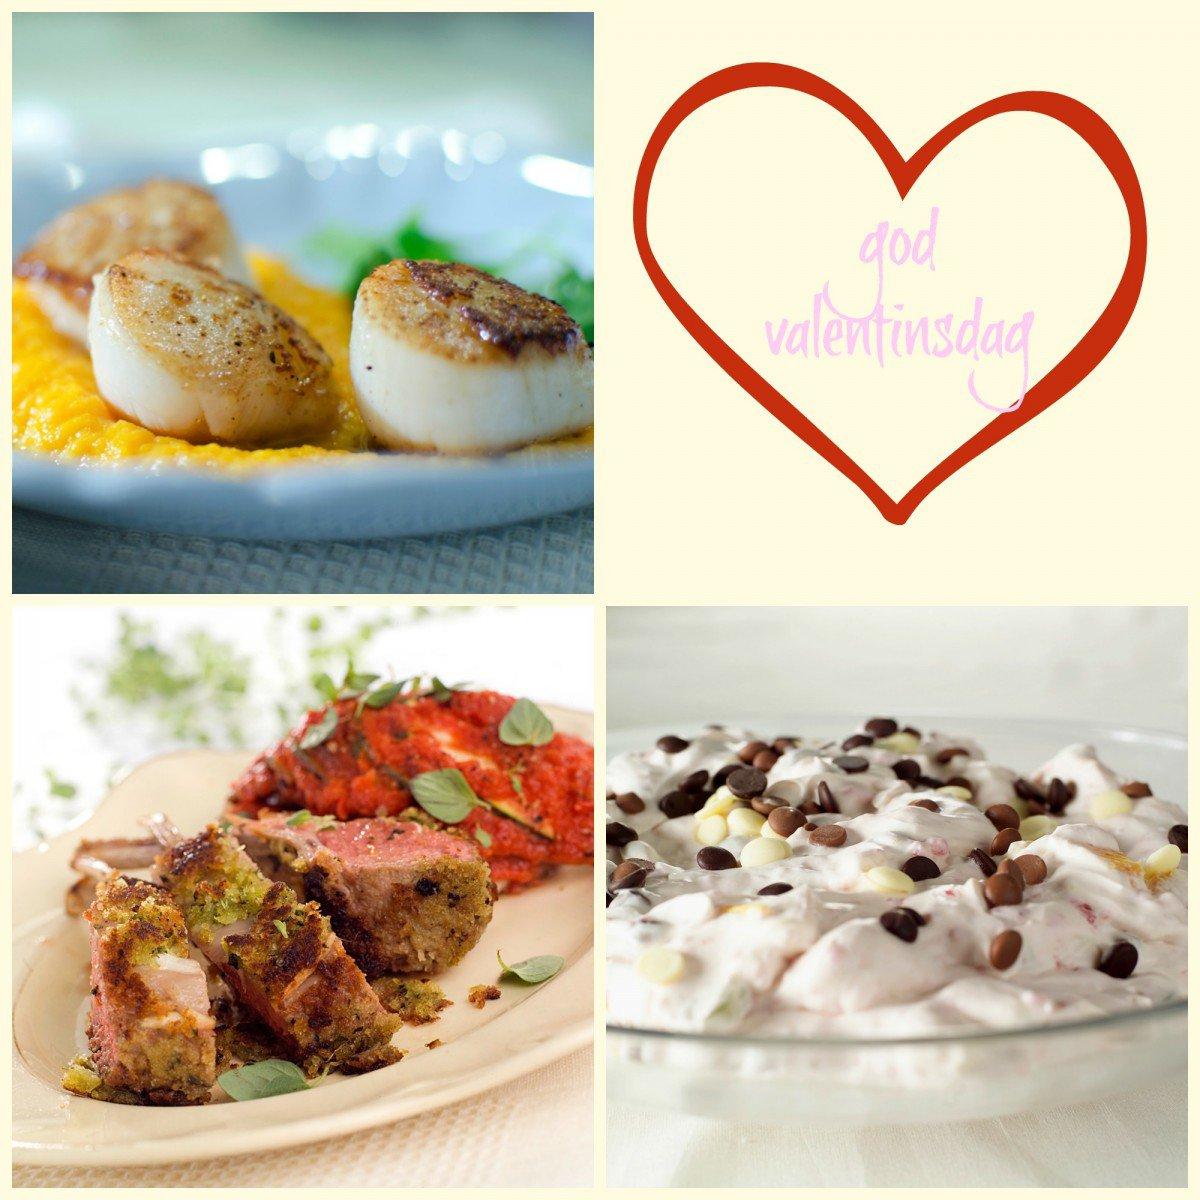 Romantisk middag til valentinsdagen